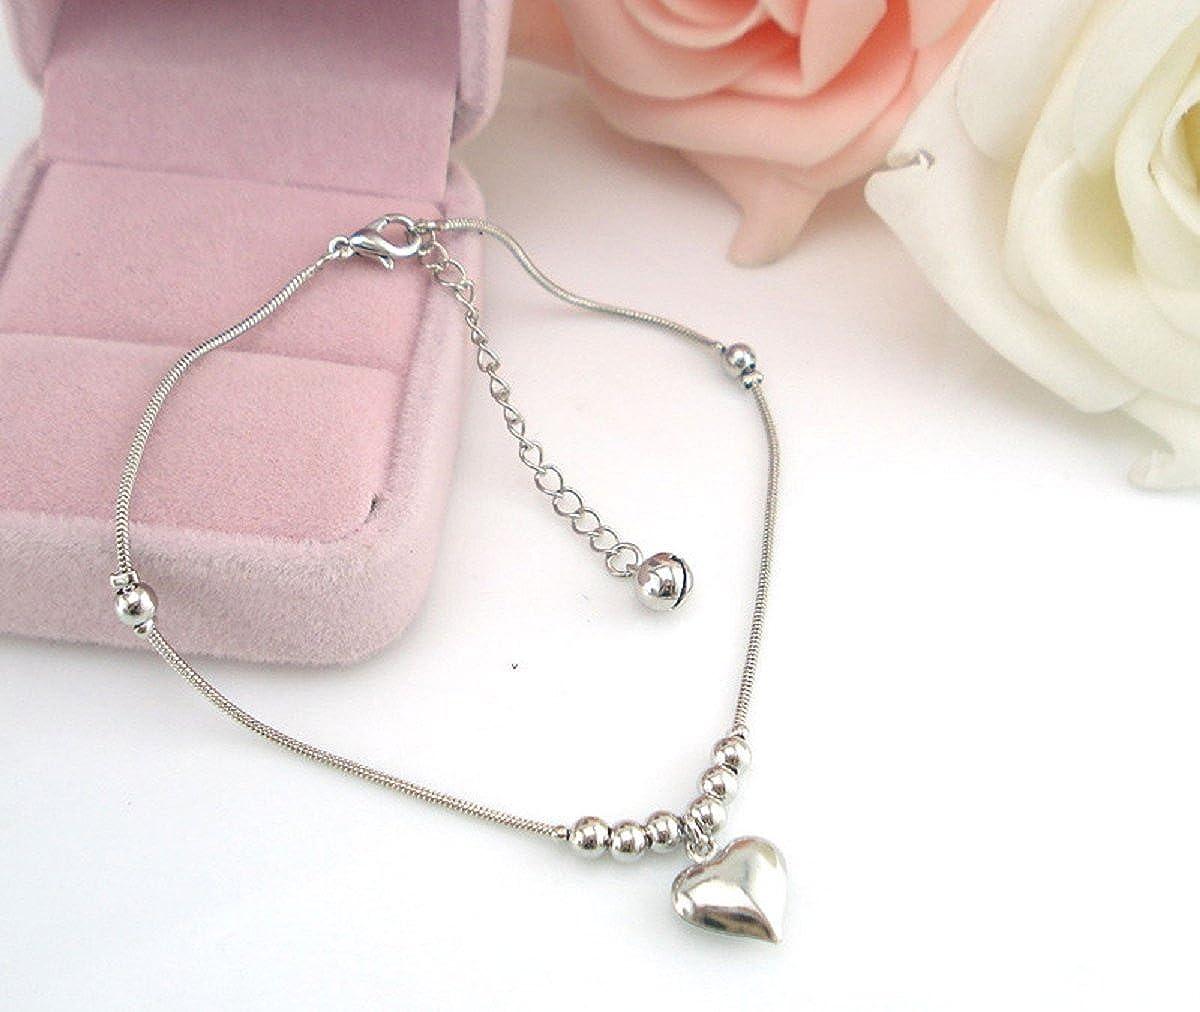 Fullkang Women Heart-shaped Pendant Dolphins Anklet Bracelet Sandal Beach Foot Jewelry